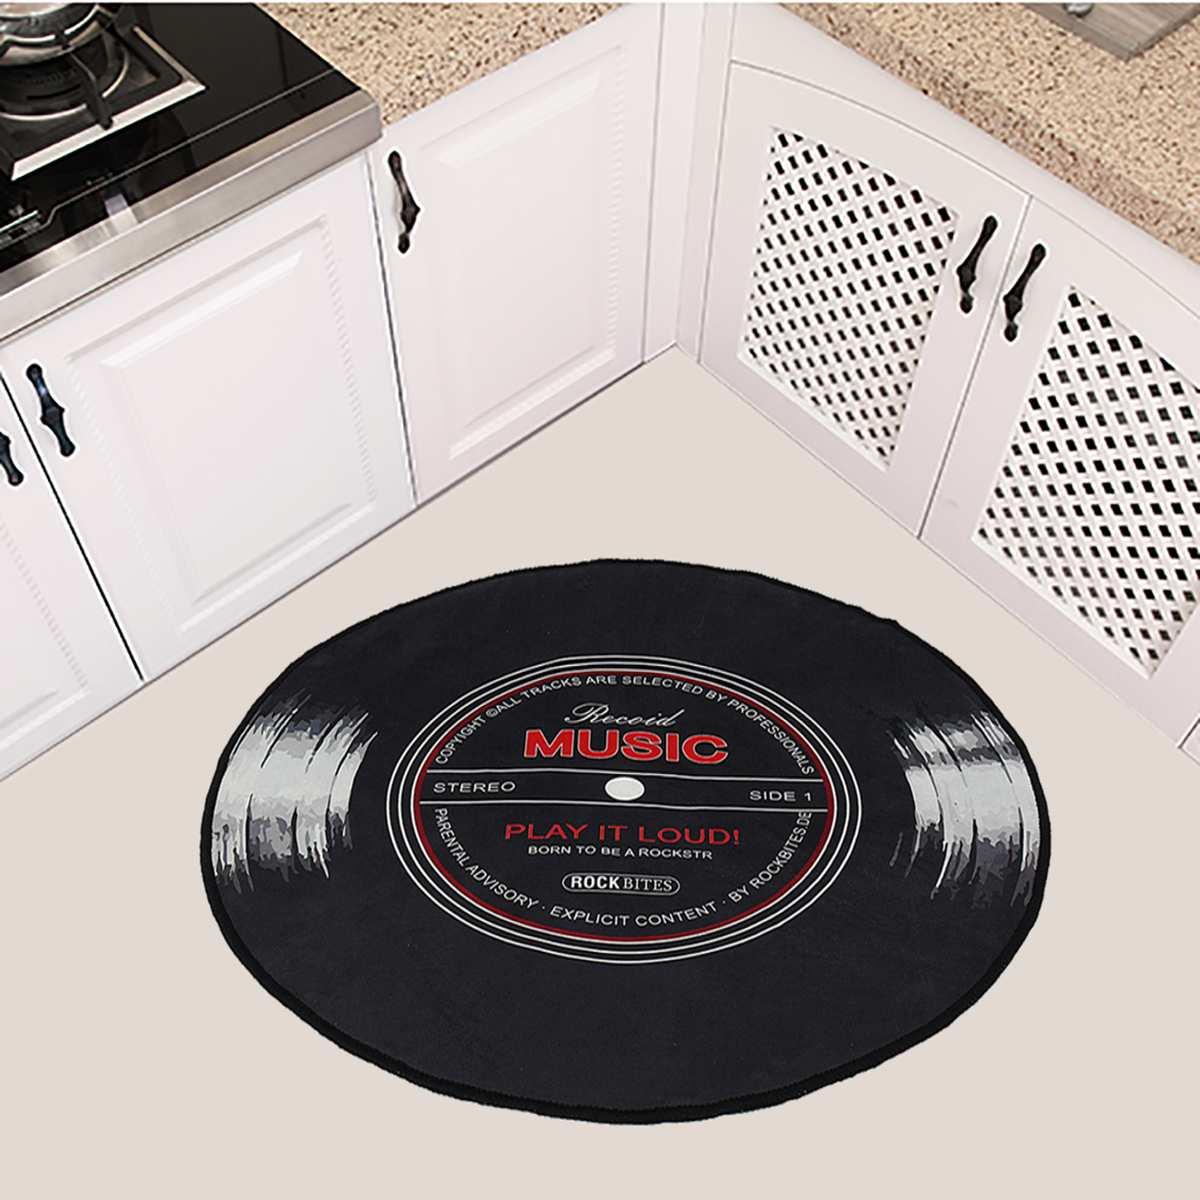 3d Album Carpets Craetive Vinyl Record MUSIC Printed Soft Fabric Round Floor Mat Carpet Room Area Bedroom Rug Home Decor Crafts